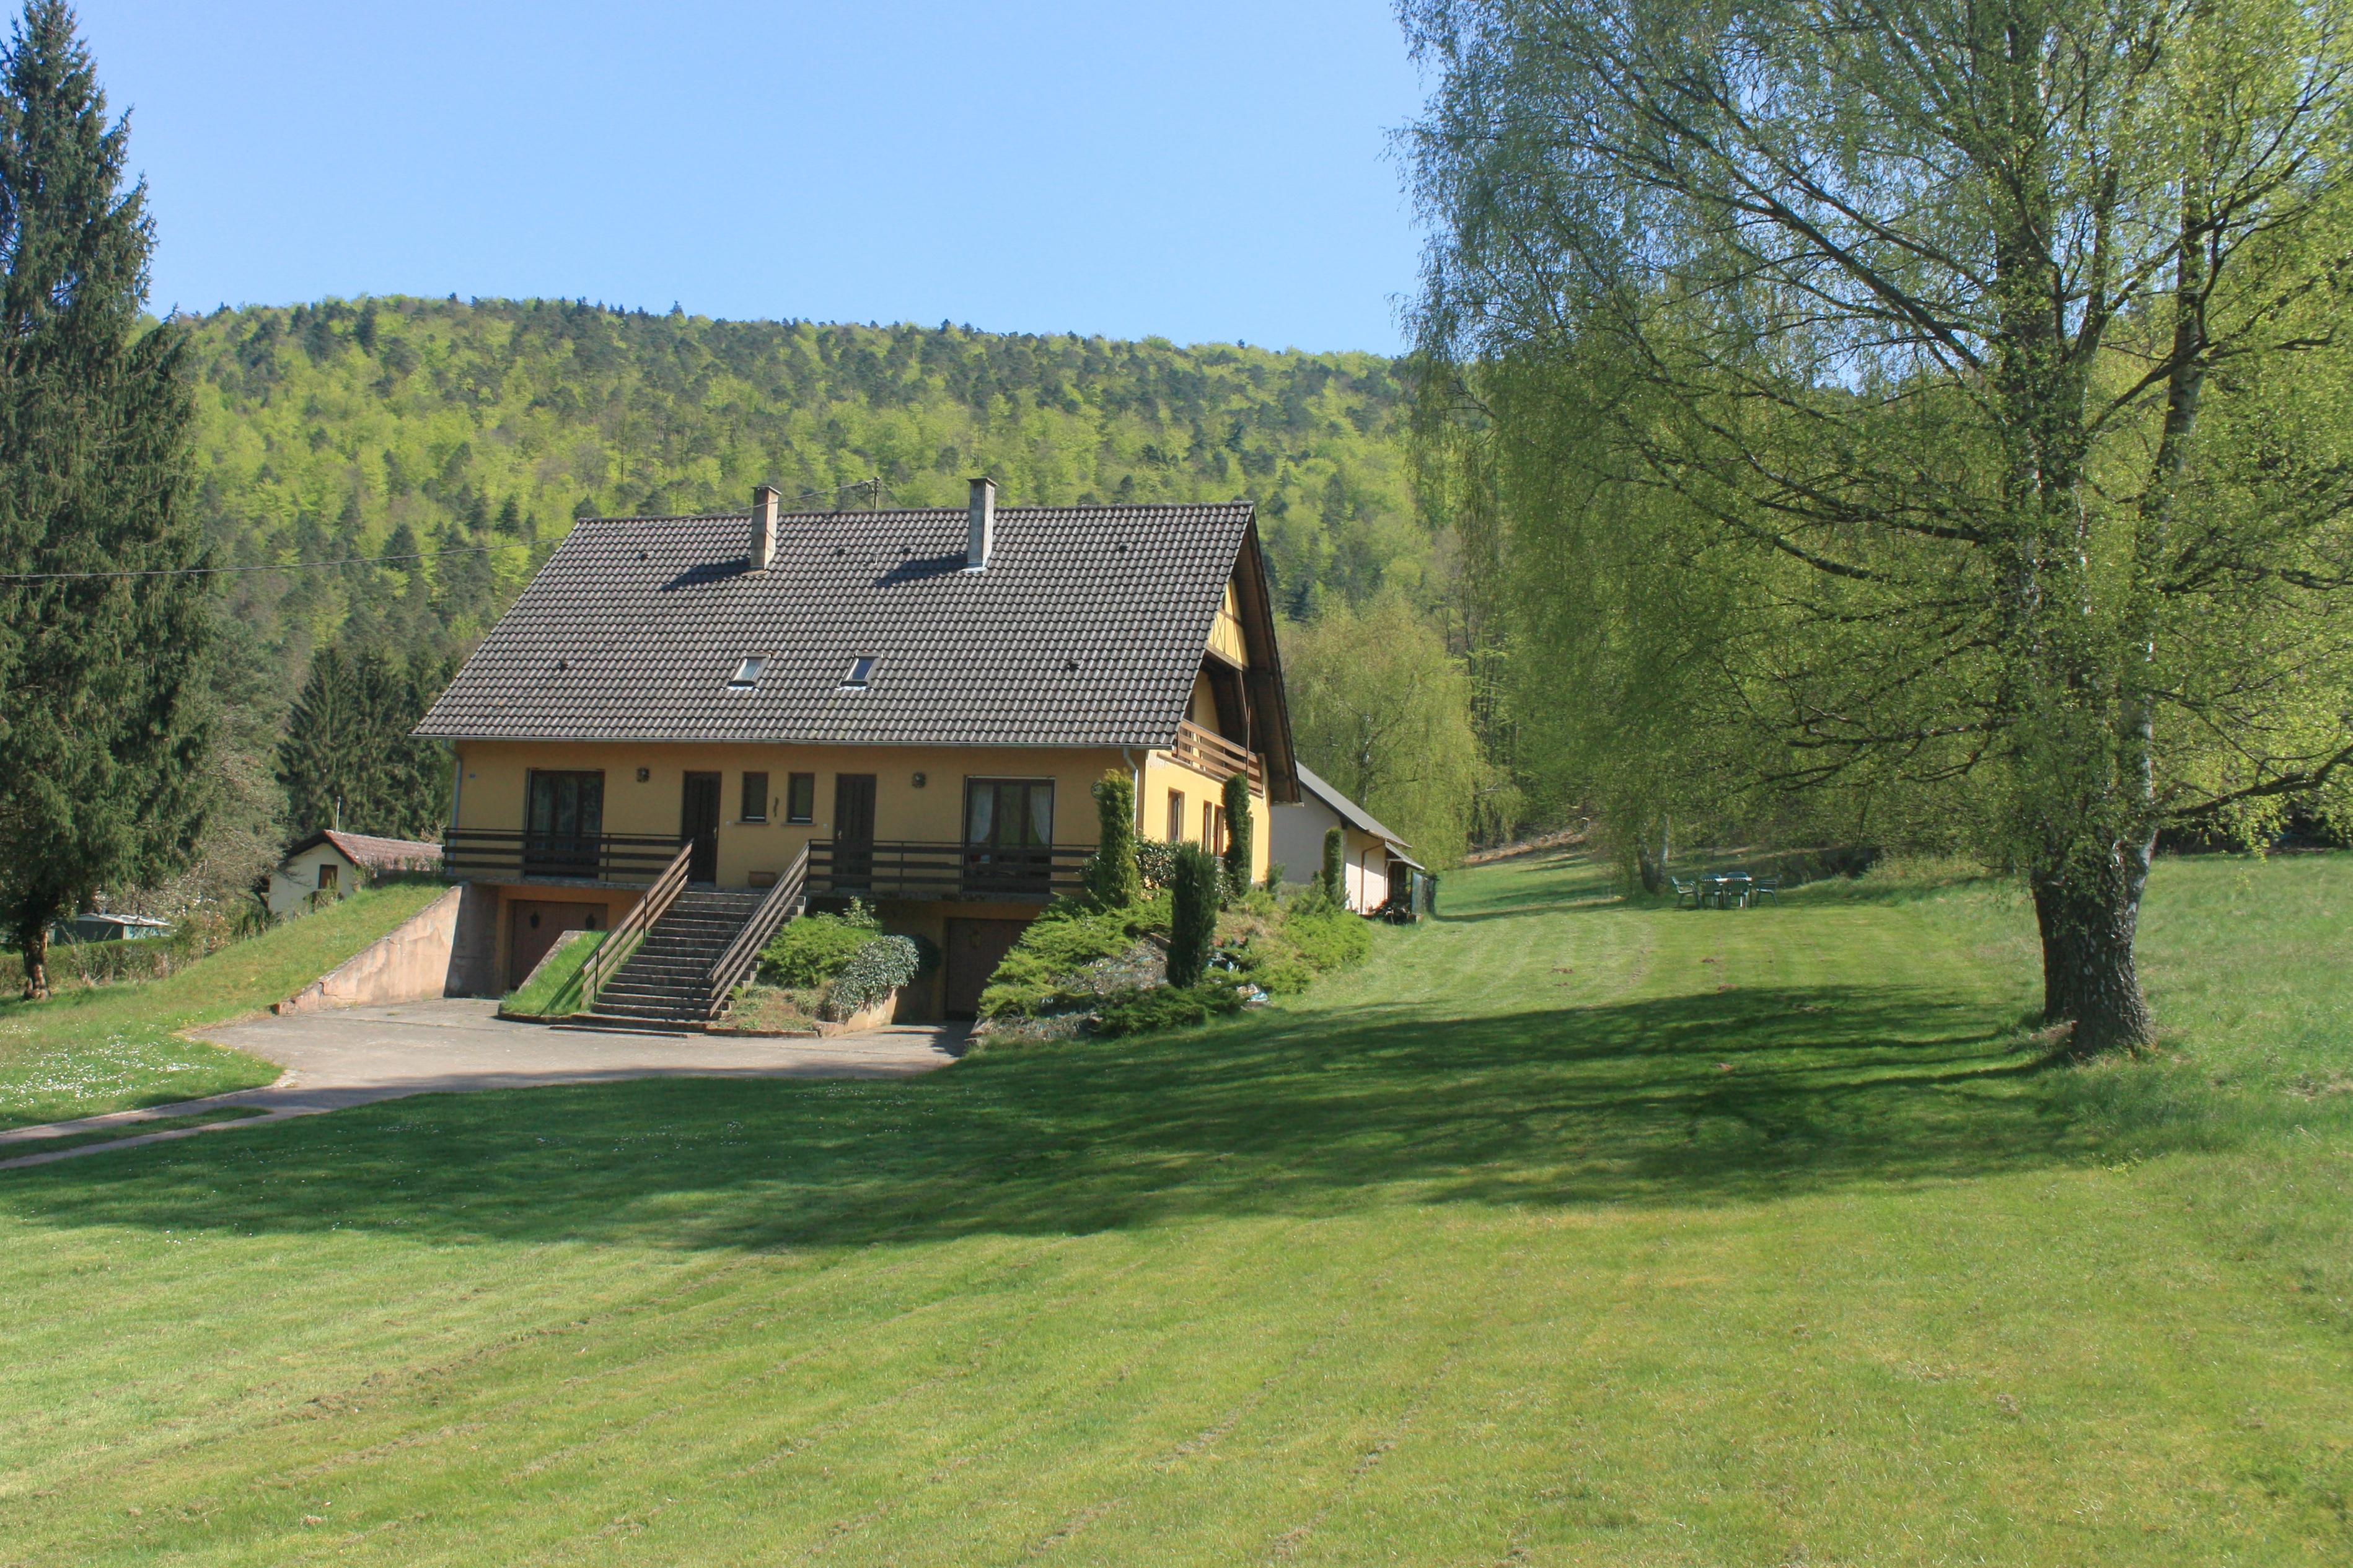 Le Grosse Huss à Wengelsbach